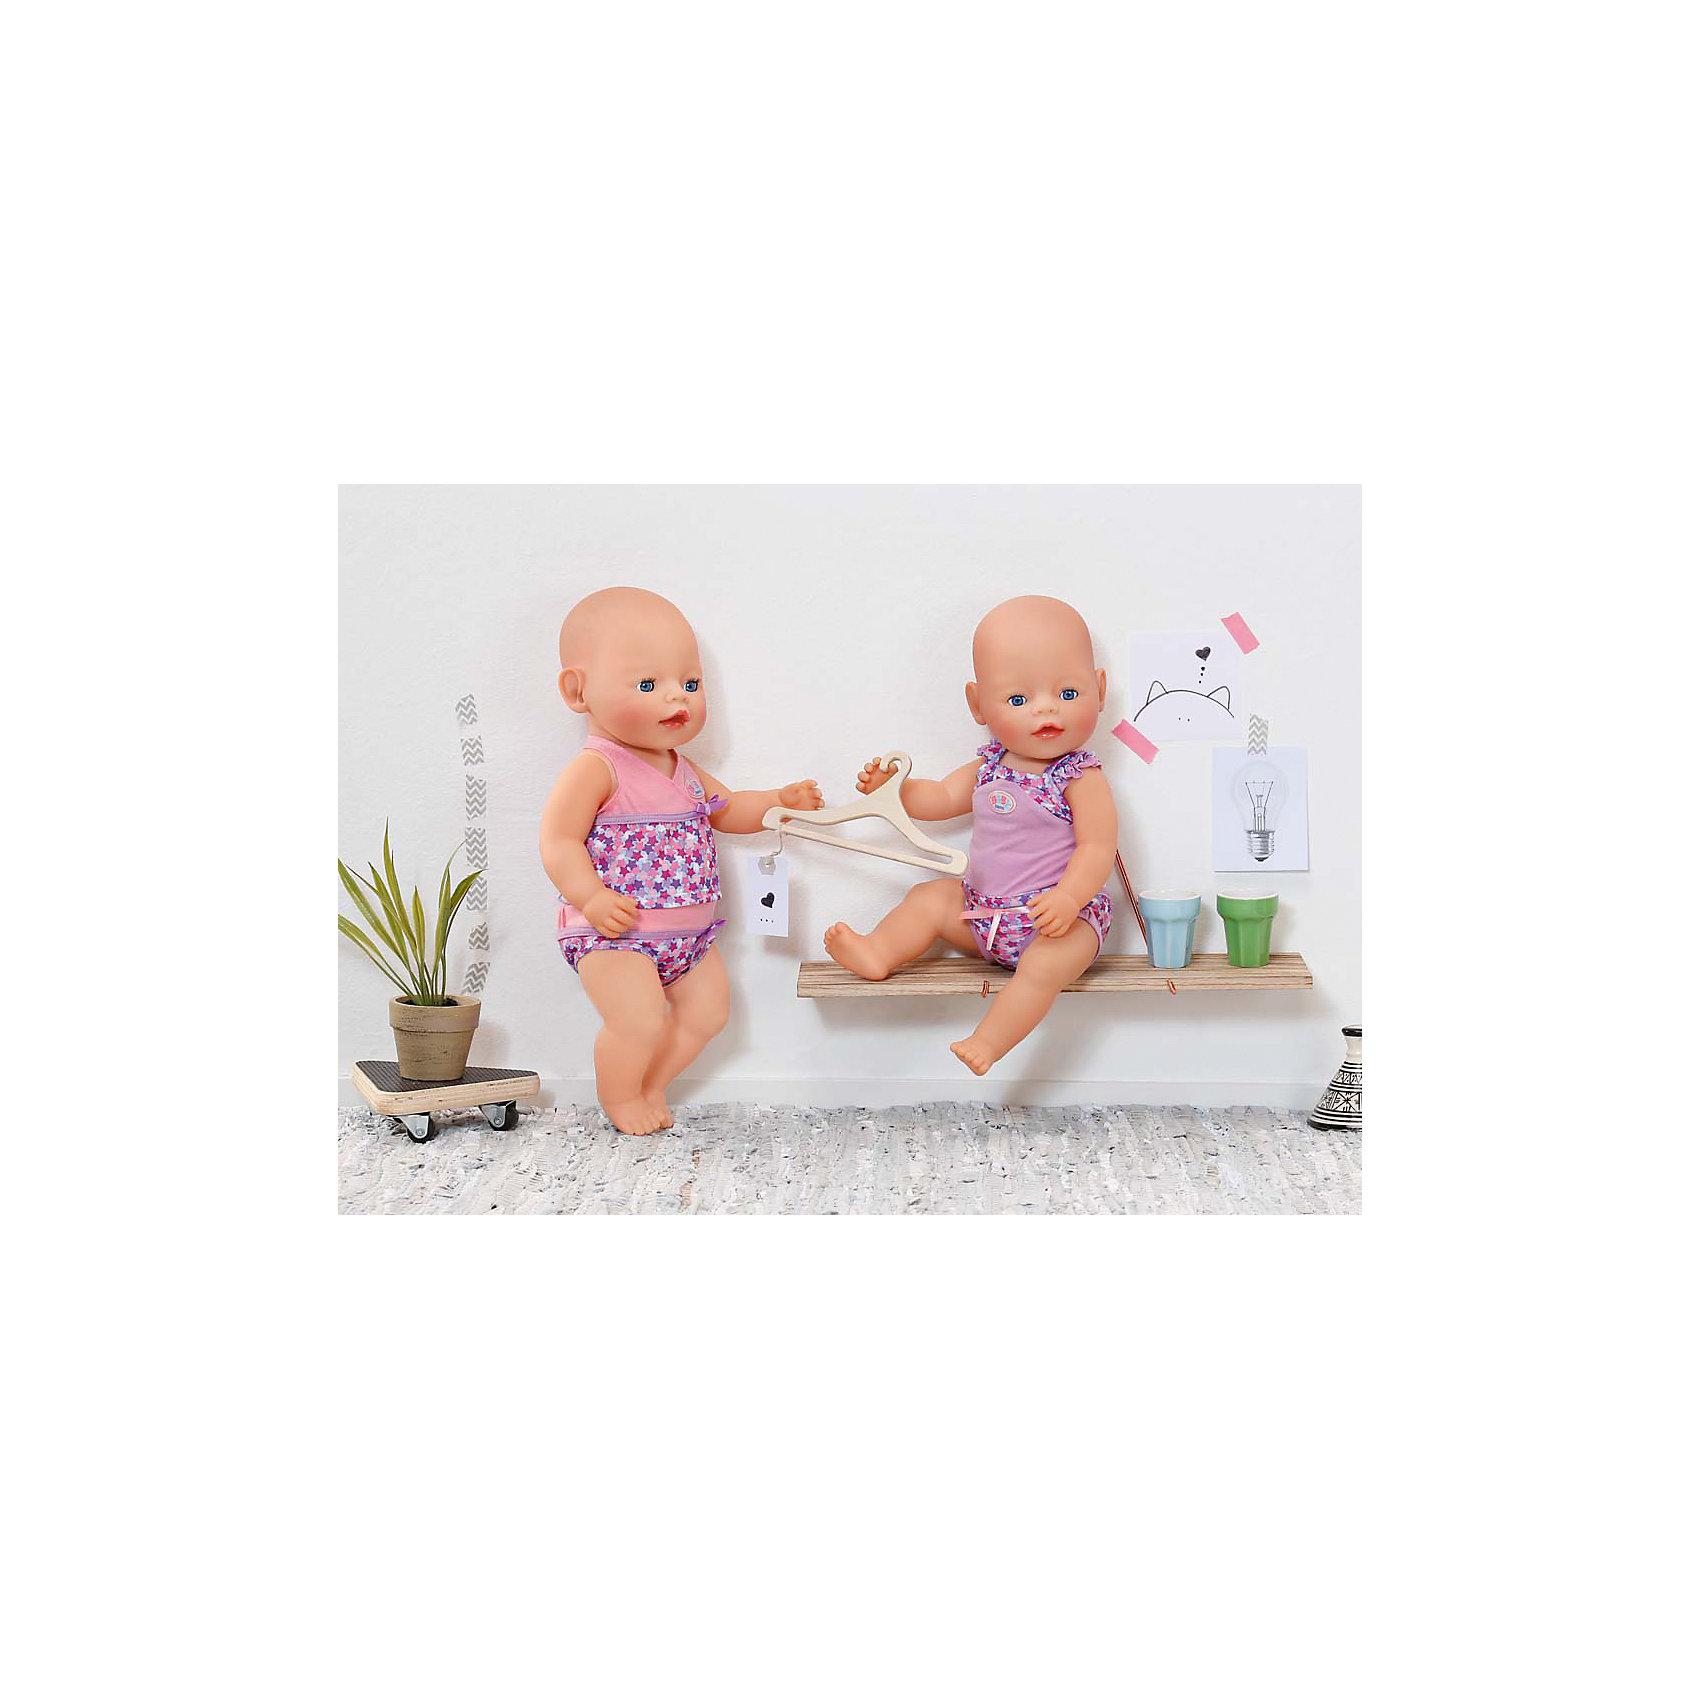 Zapf Creation Нижнее белье, розово-фиолетовый, BABY born куклы и одежда для кукол zapf creation baby annabell памперсы 5 штук